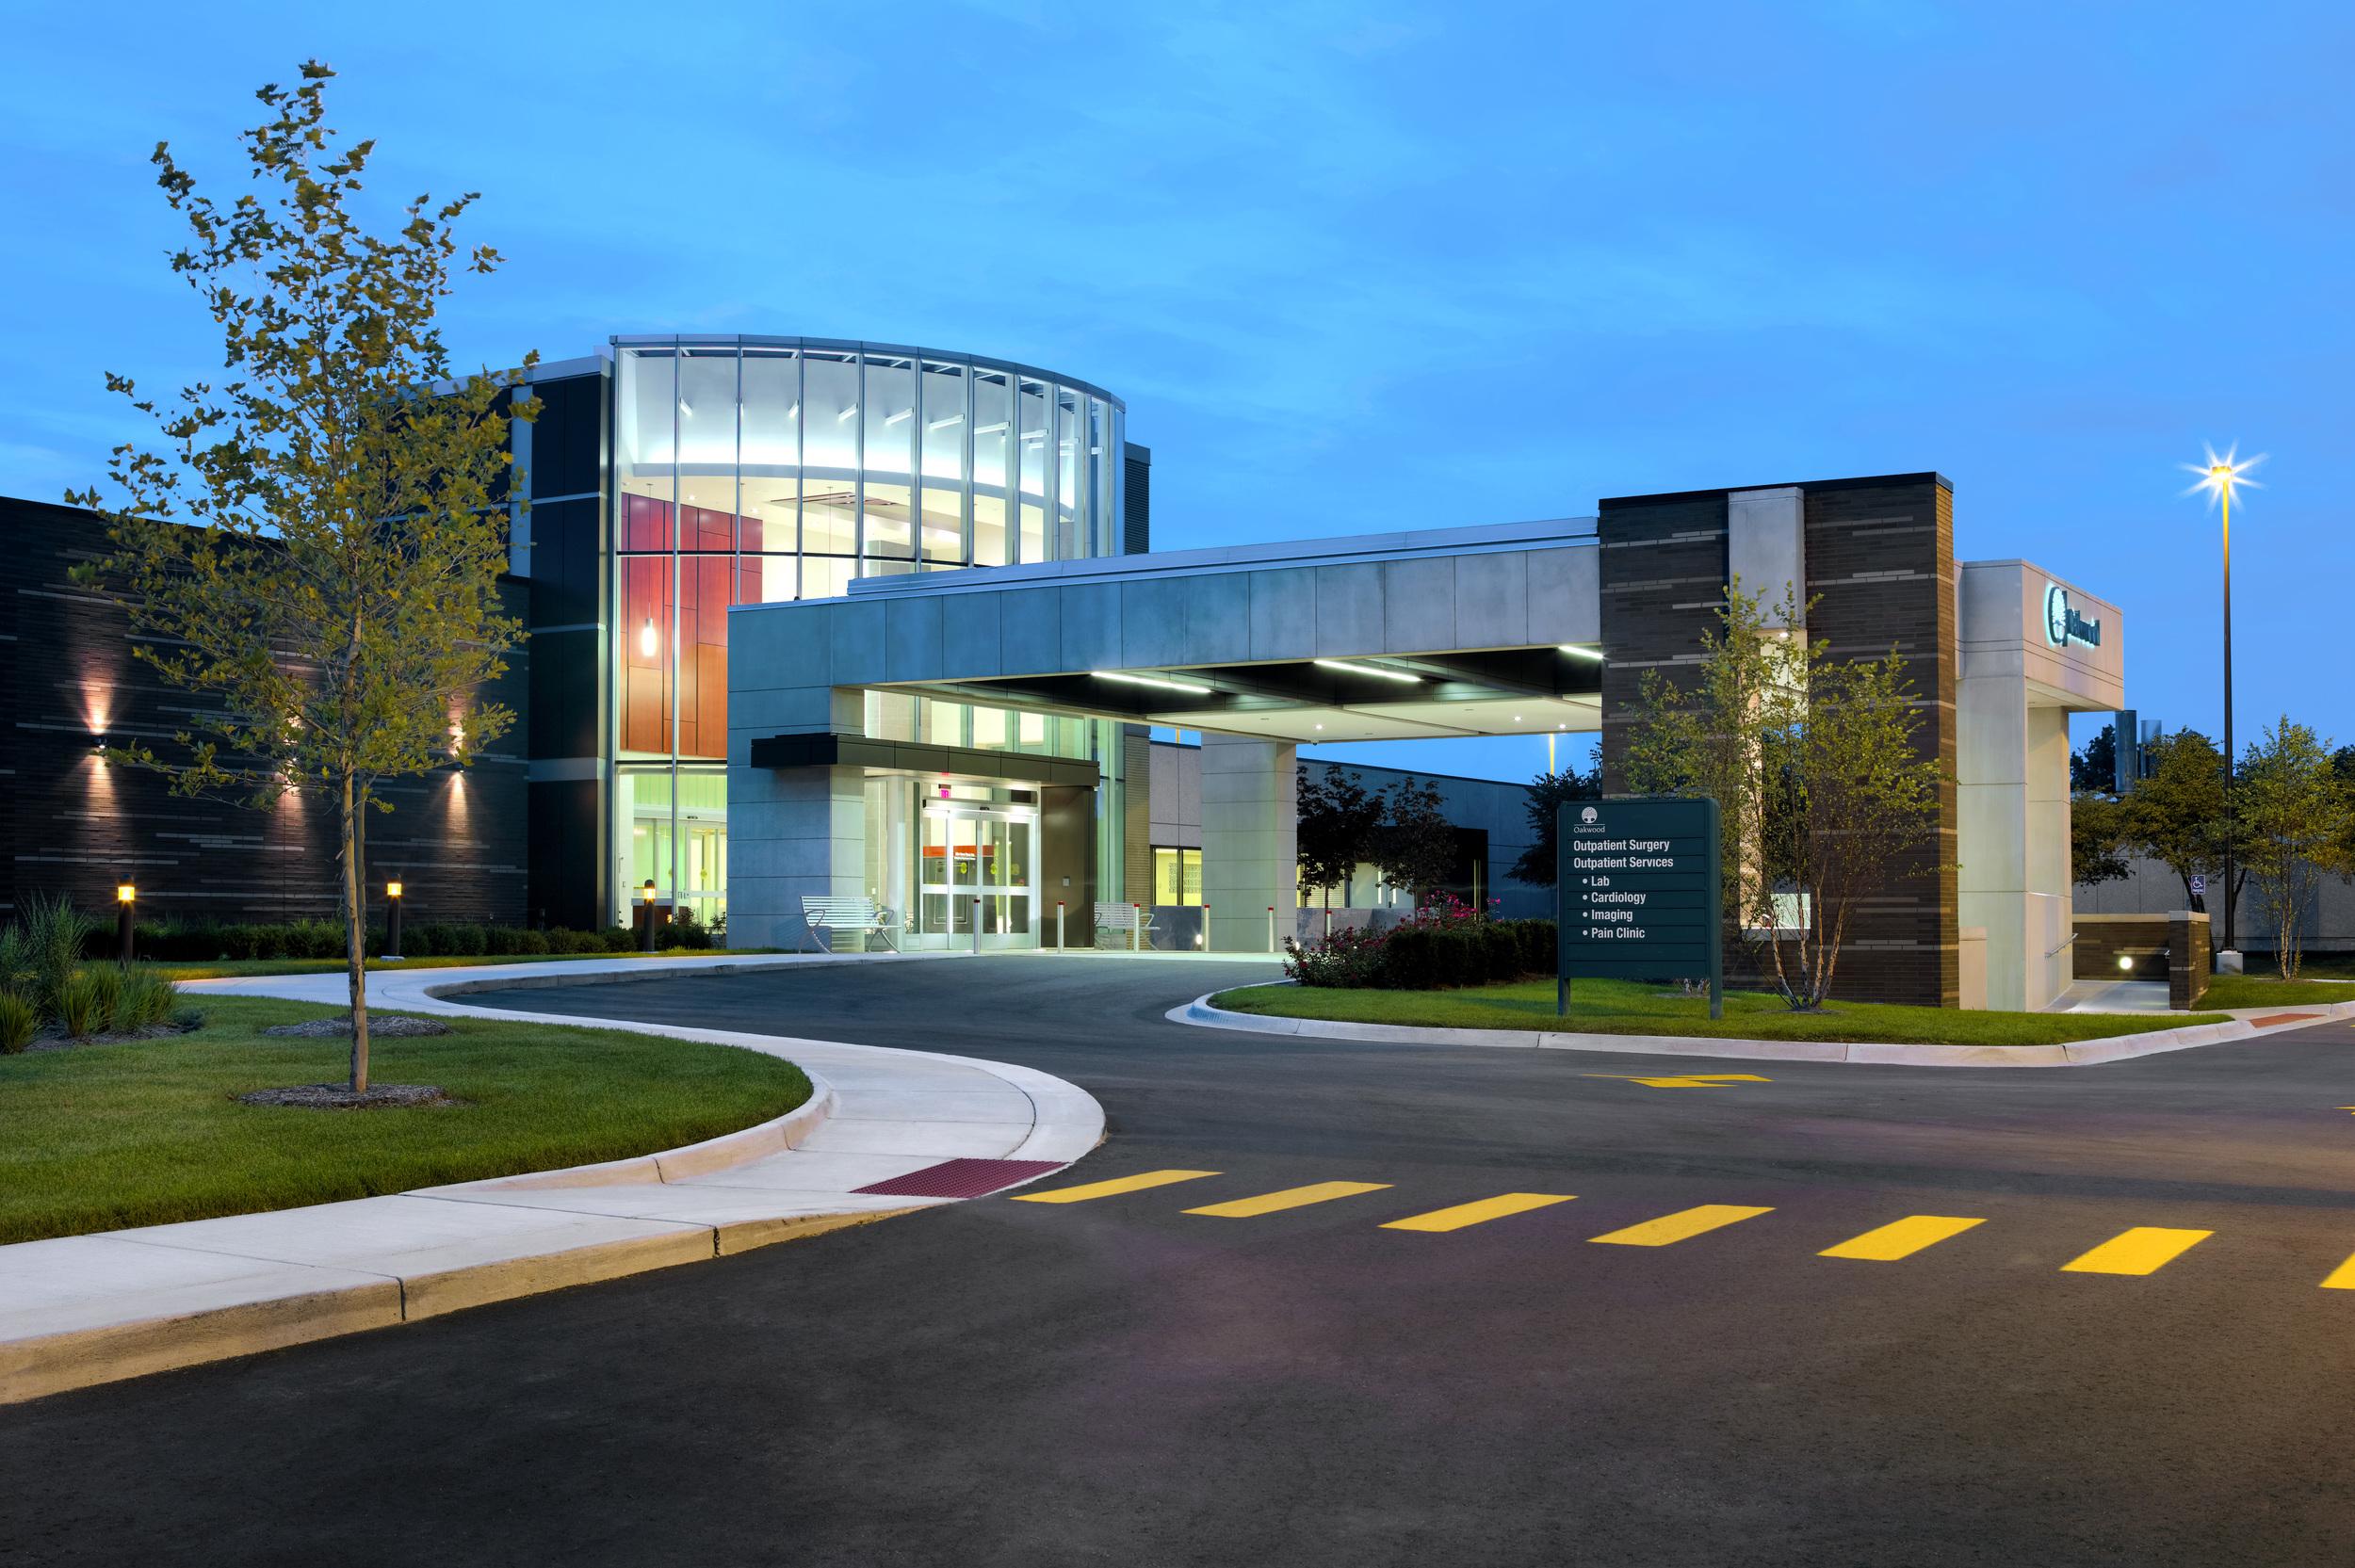 oakwood-heritage-hospital-canopy